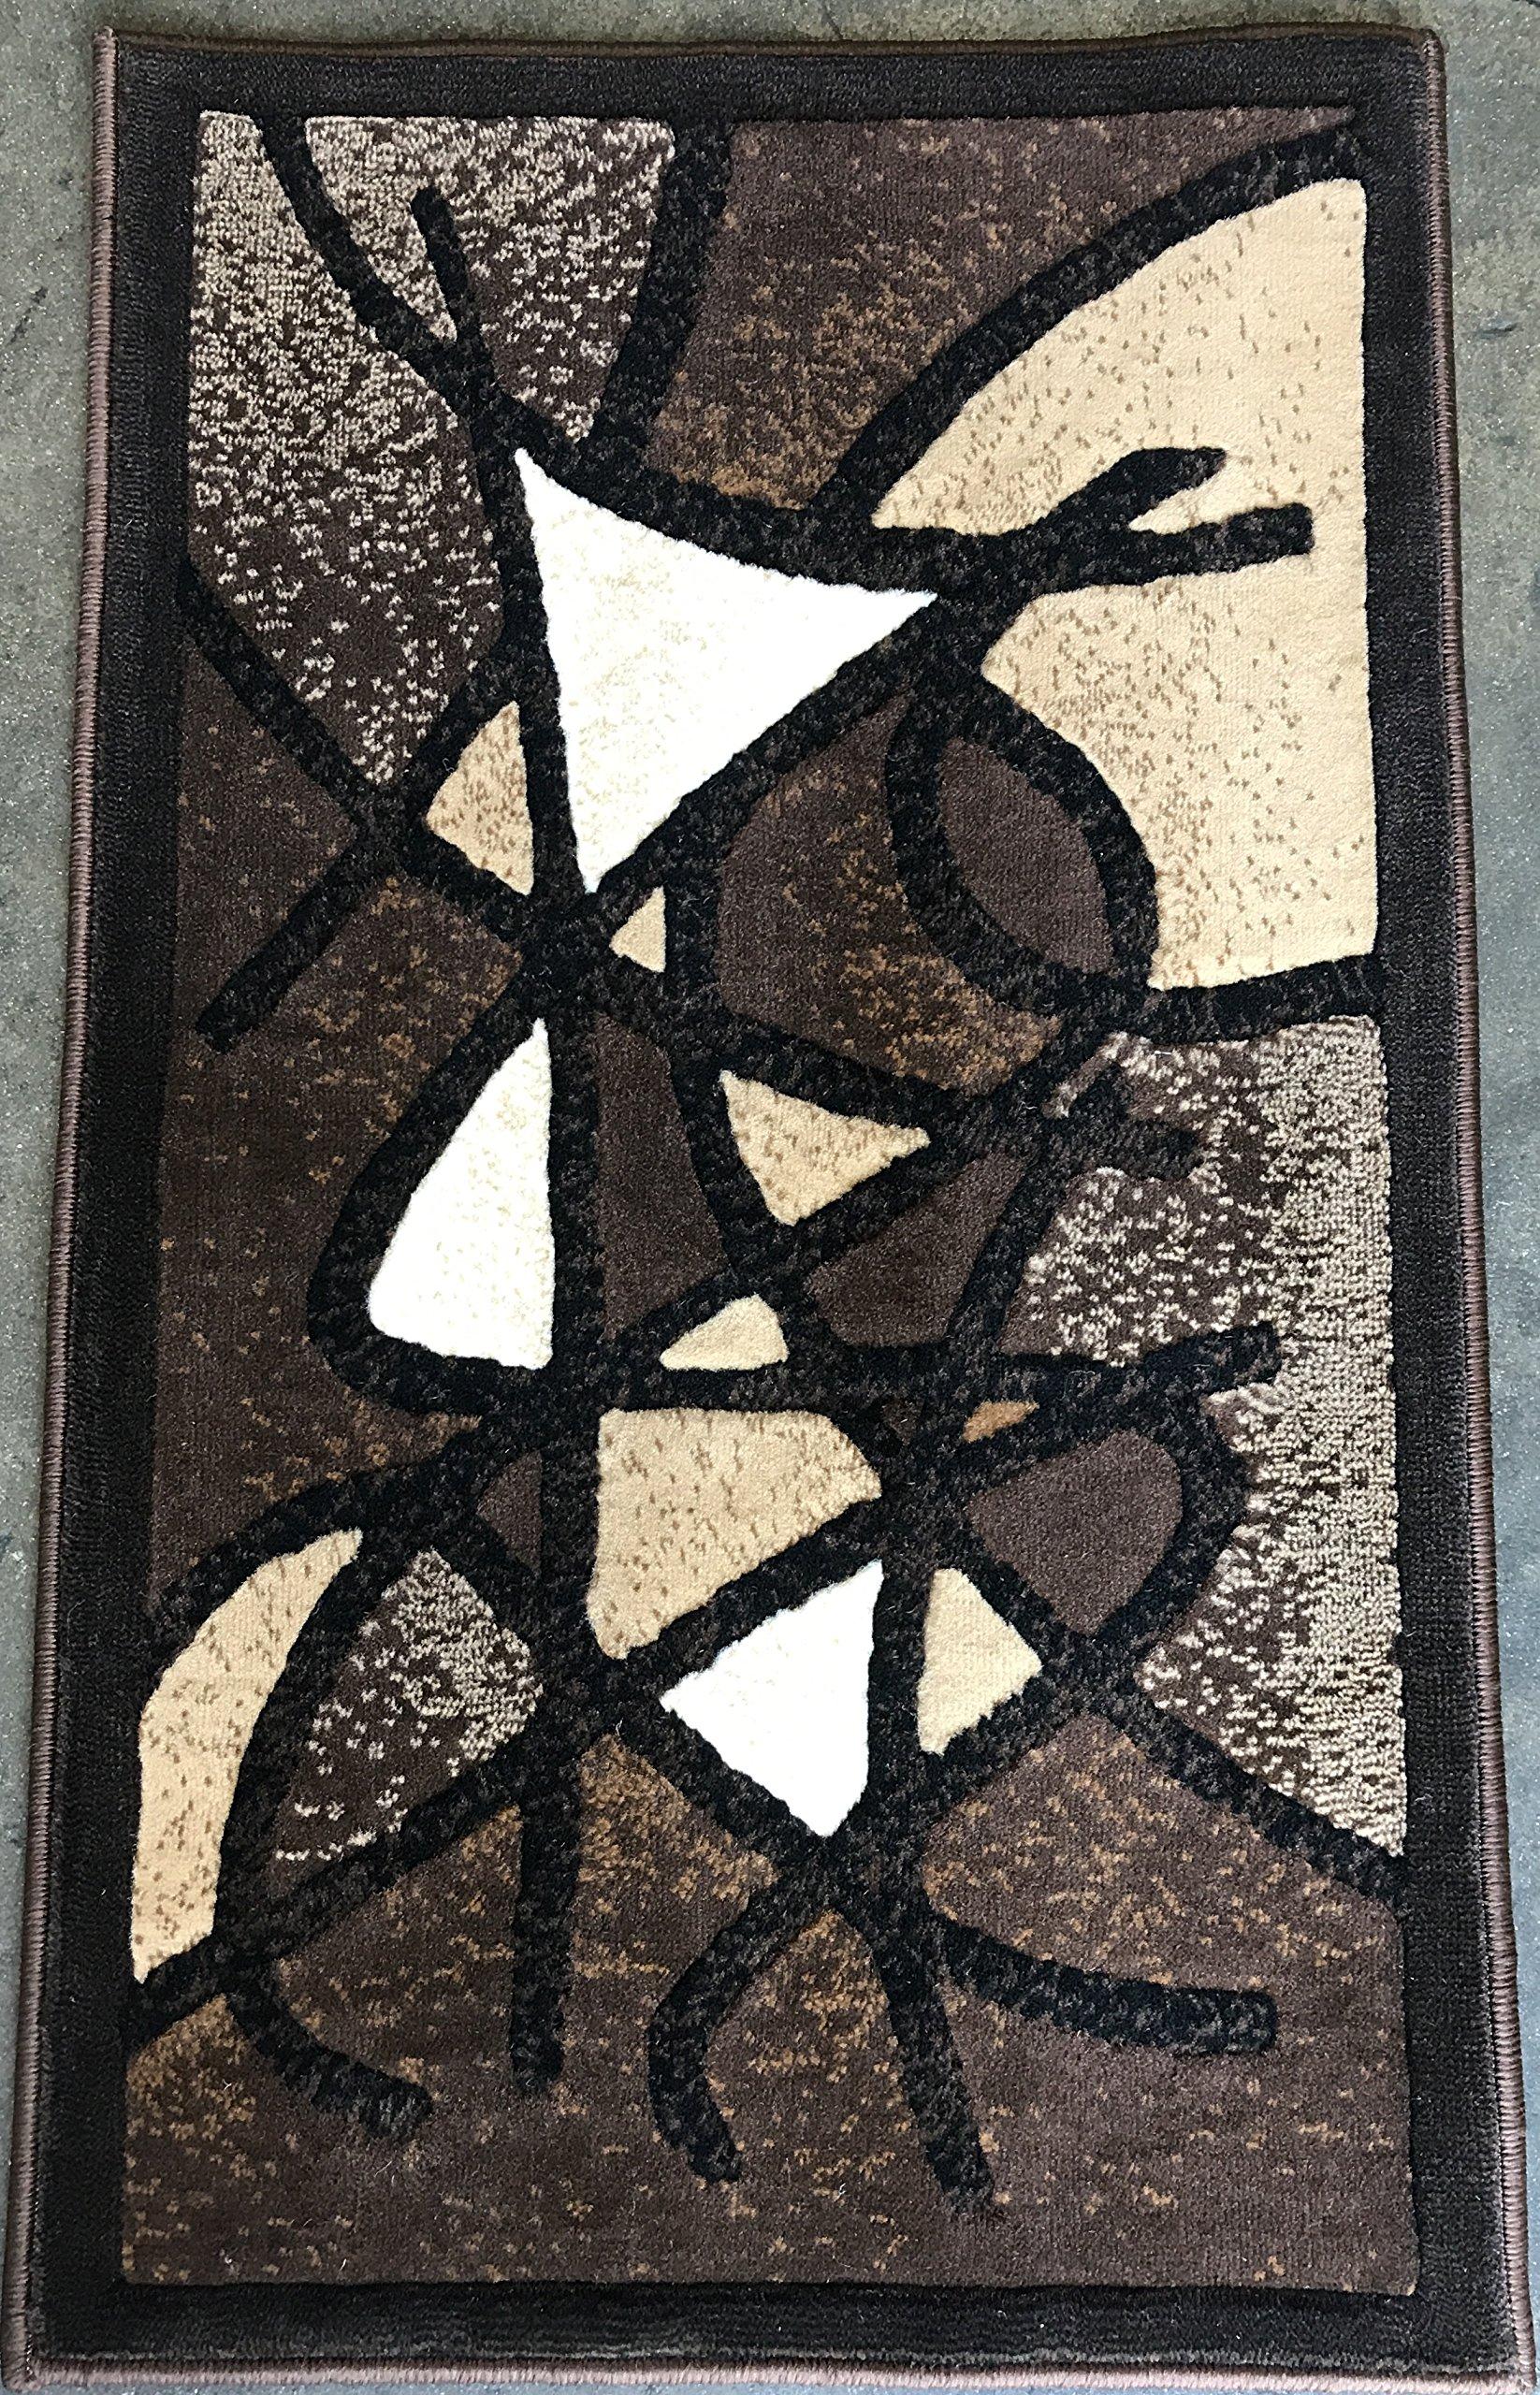 Gallery Modern Abstract Door Mat Chocolate Brown & Black Contemporary Design GL24 (2 Feet X 3 Feet 4 Inch)